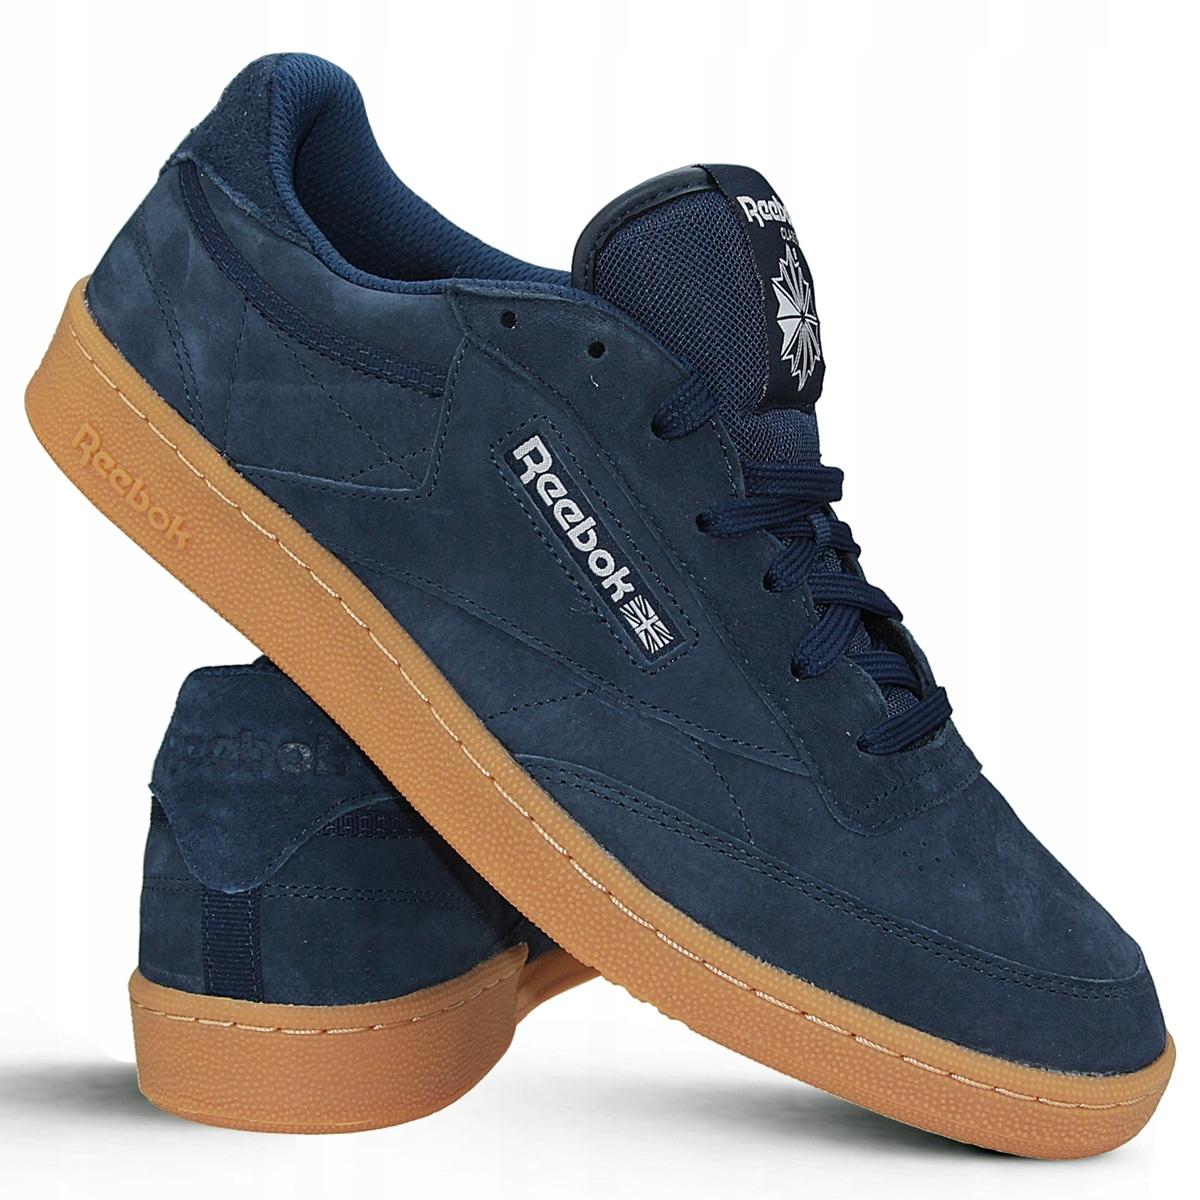 Reebok Shoes Club C 85 Резинка SU CN1360 Кожа